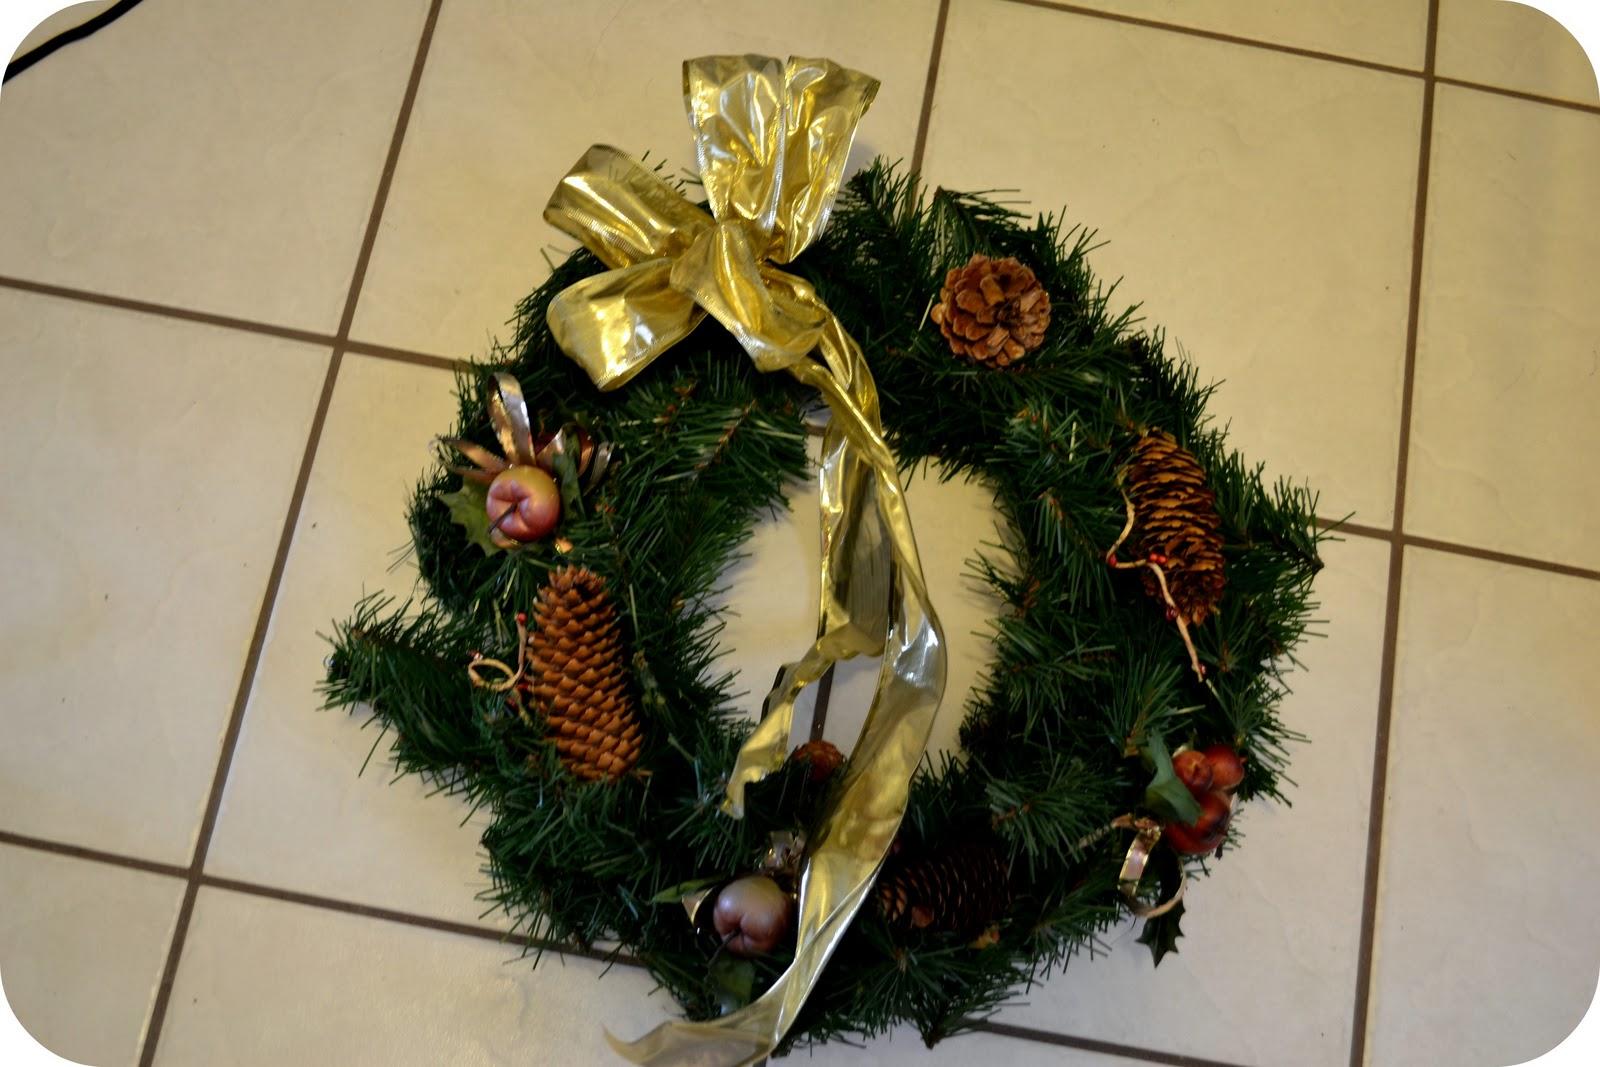 The sparacino chronicles christmas deco mesh wreath tutorial christmas deco mesh wreath tutorial baditri Images